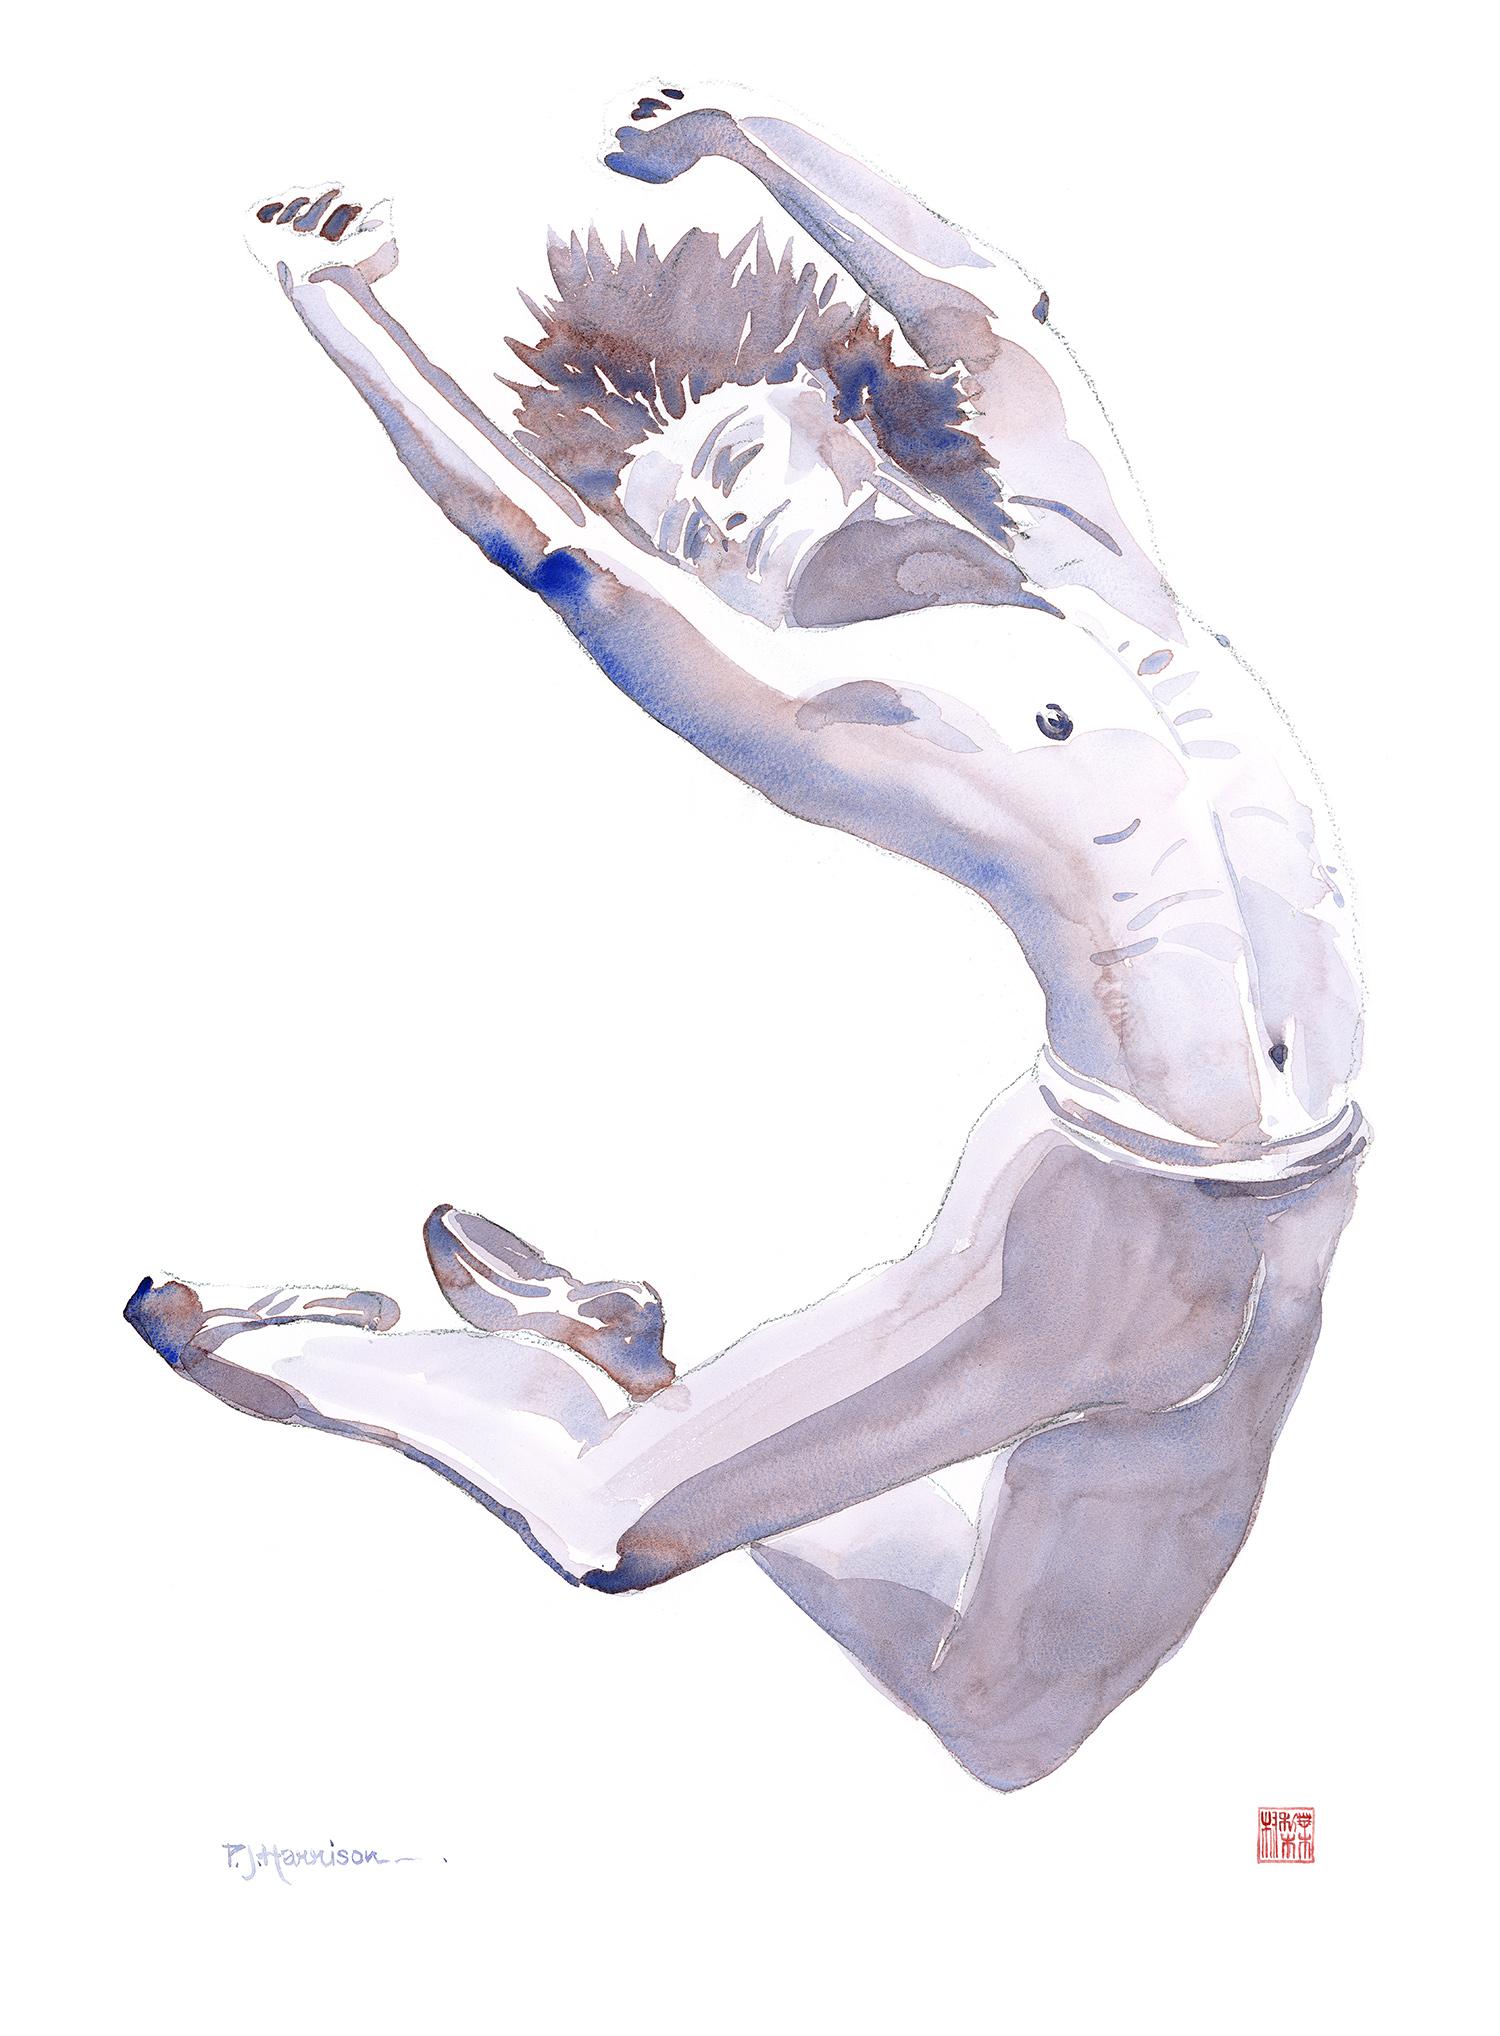 Sergei-I-Pink-Harrison-Artist-Broadway-Cotswolds-England.jpg